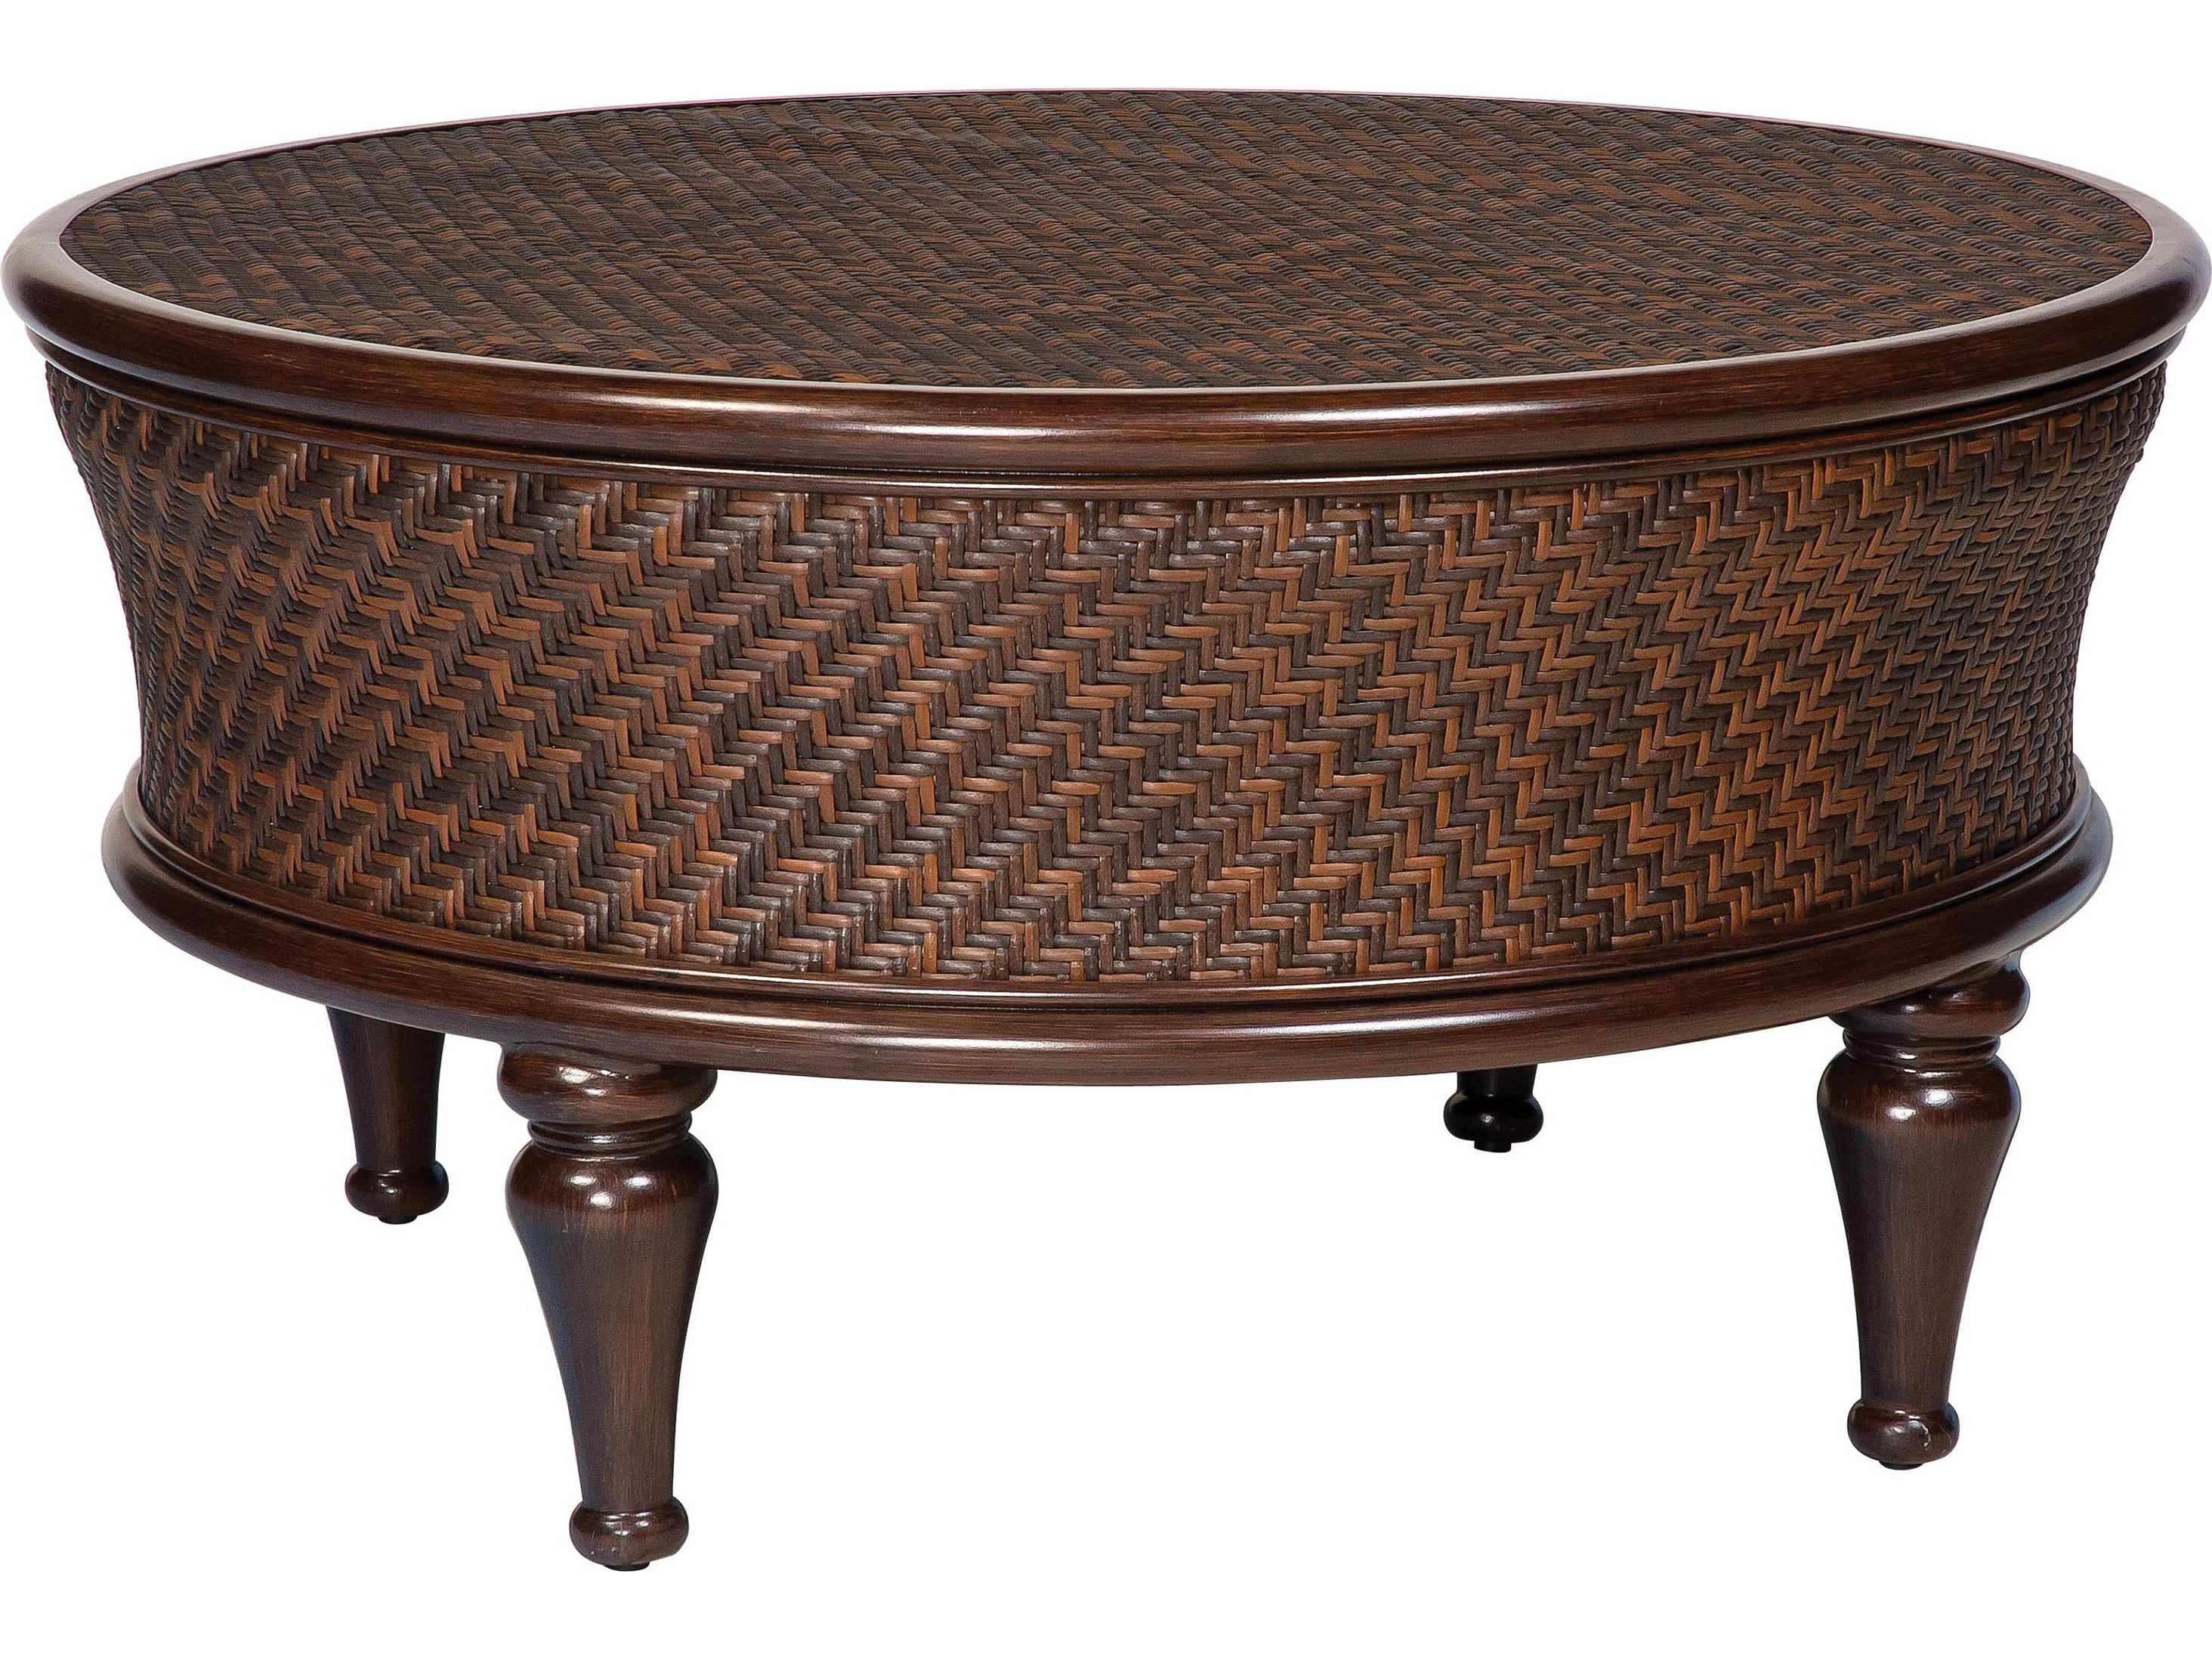 whitecraft north shore wicker 42 5 round storage coffee table s540211. Black Bedroom Furniture Sets. Home Design Ideas